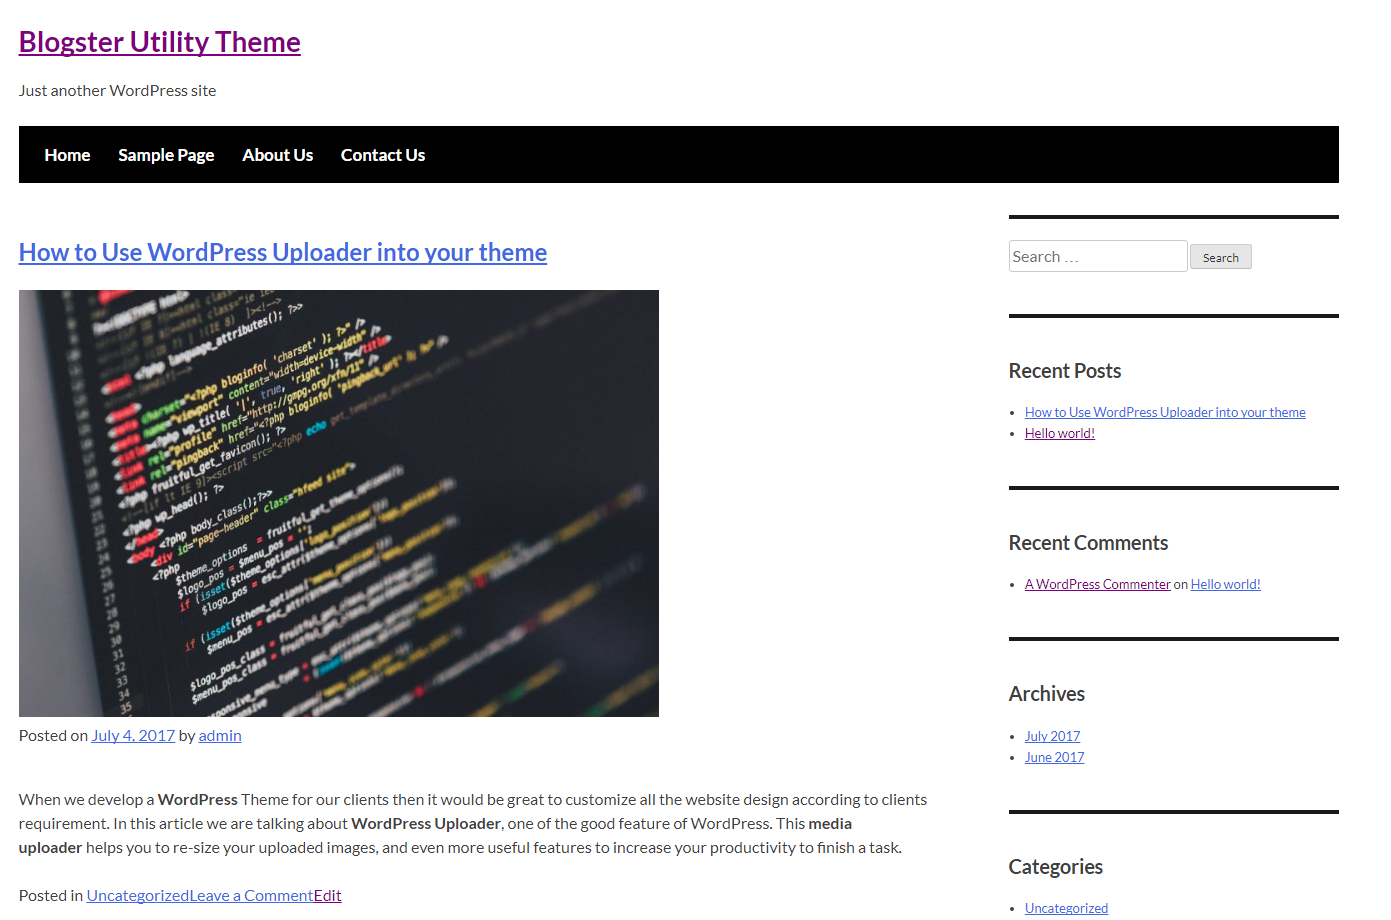 https://themes.svn.wordpress.org/blogster-utility/1.0.6/screenshot.png